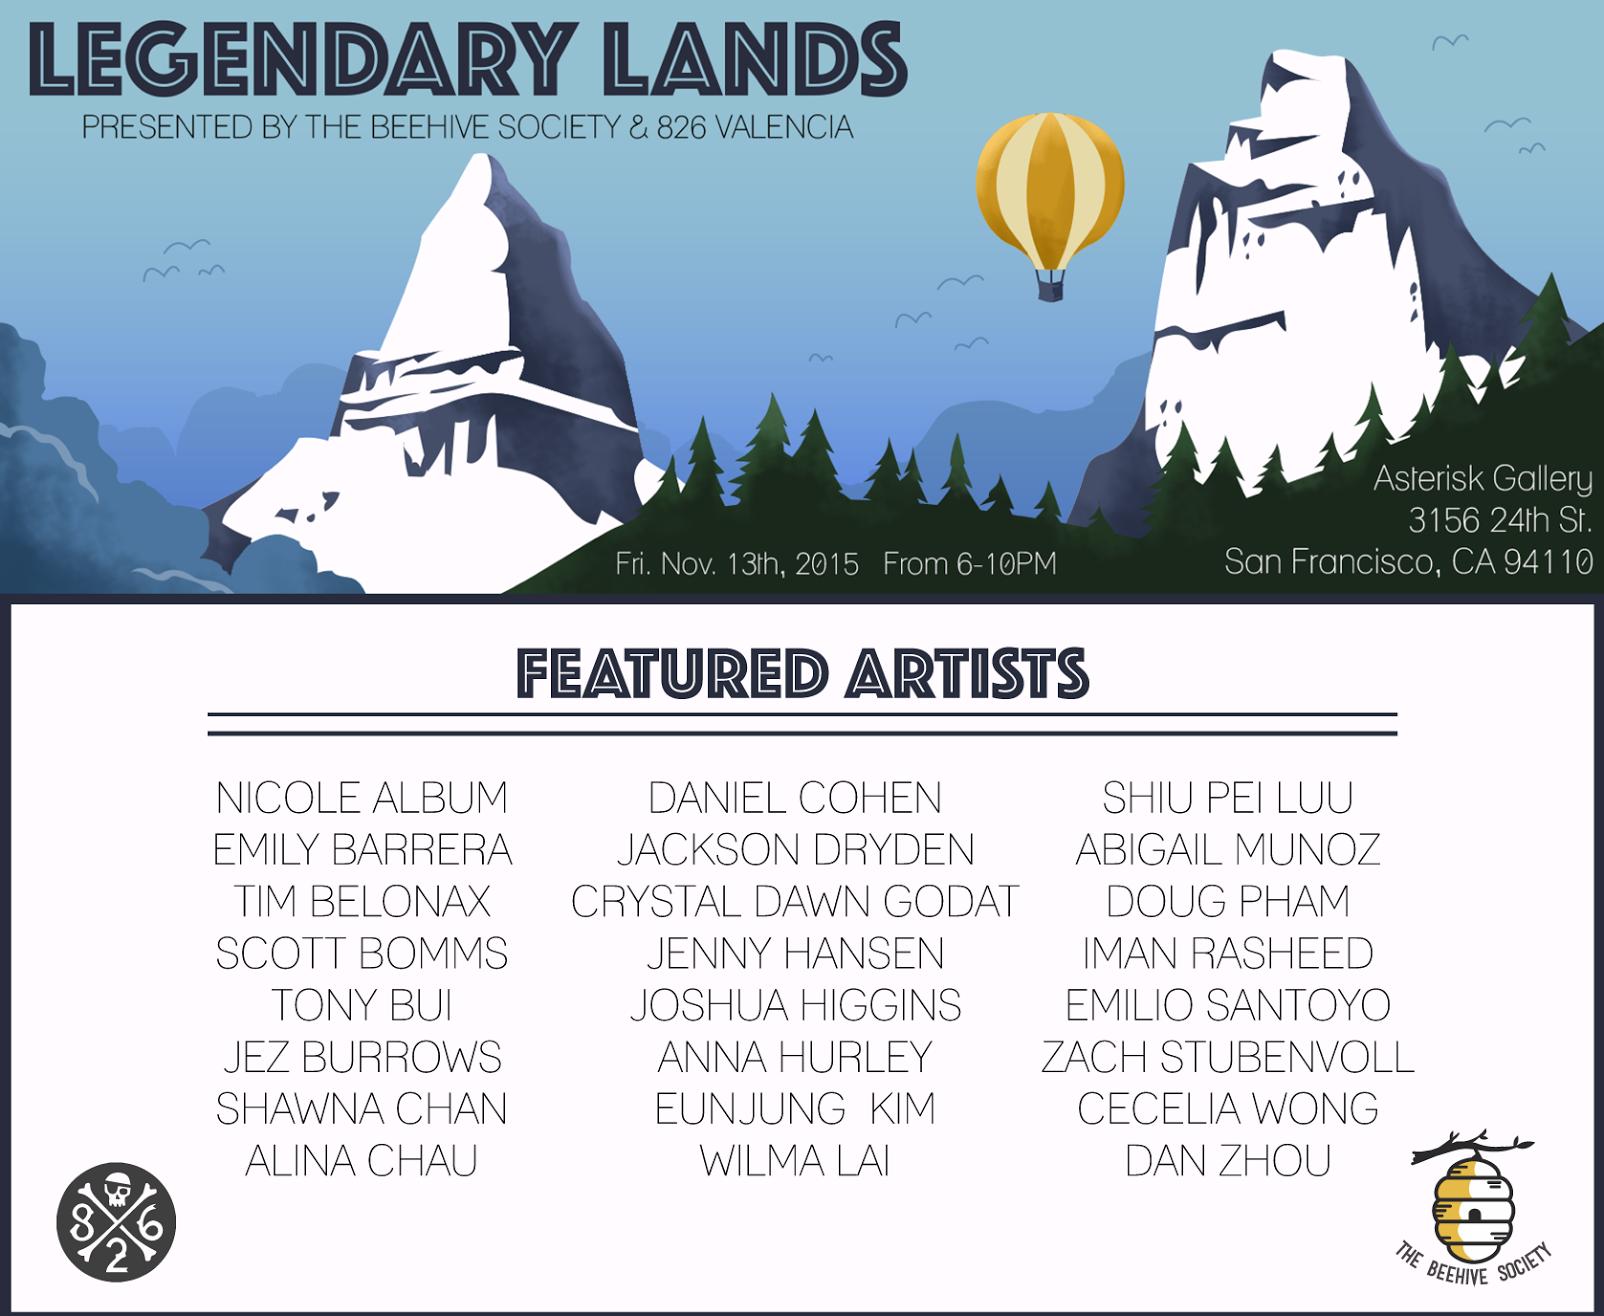 legendarylands